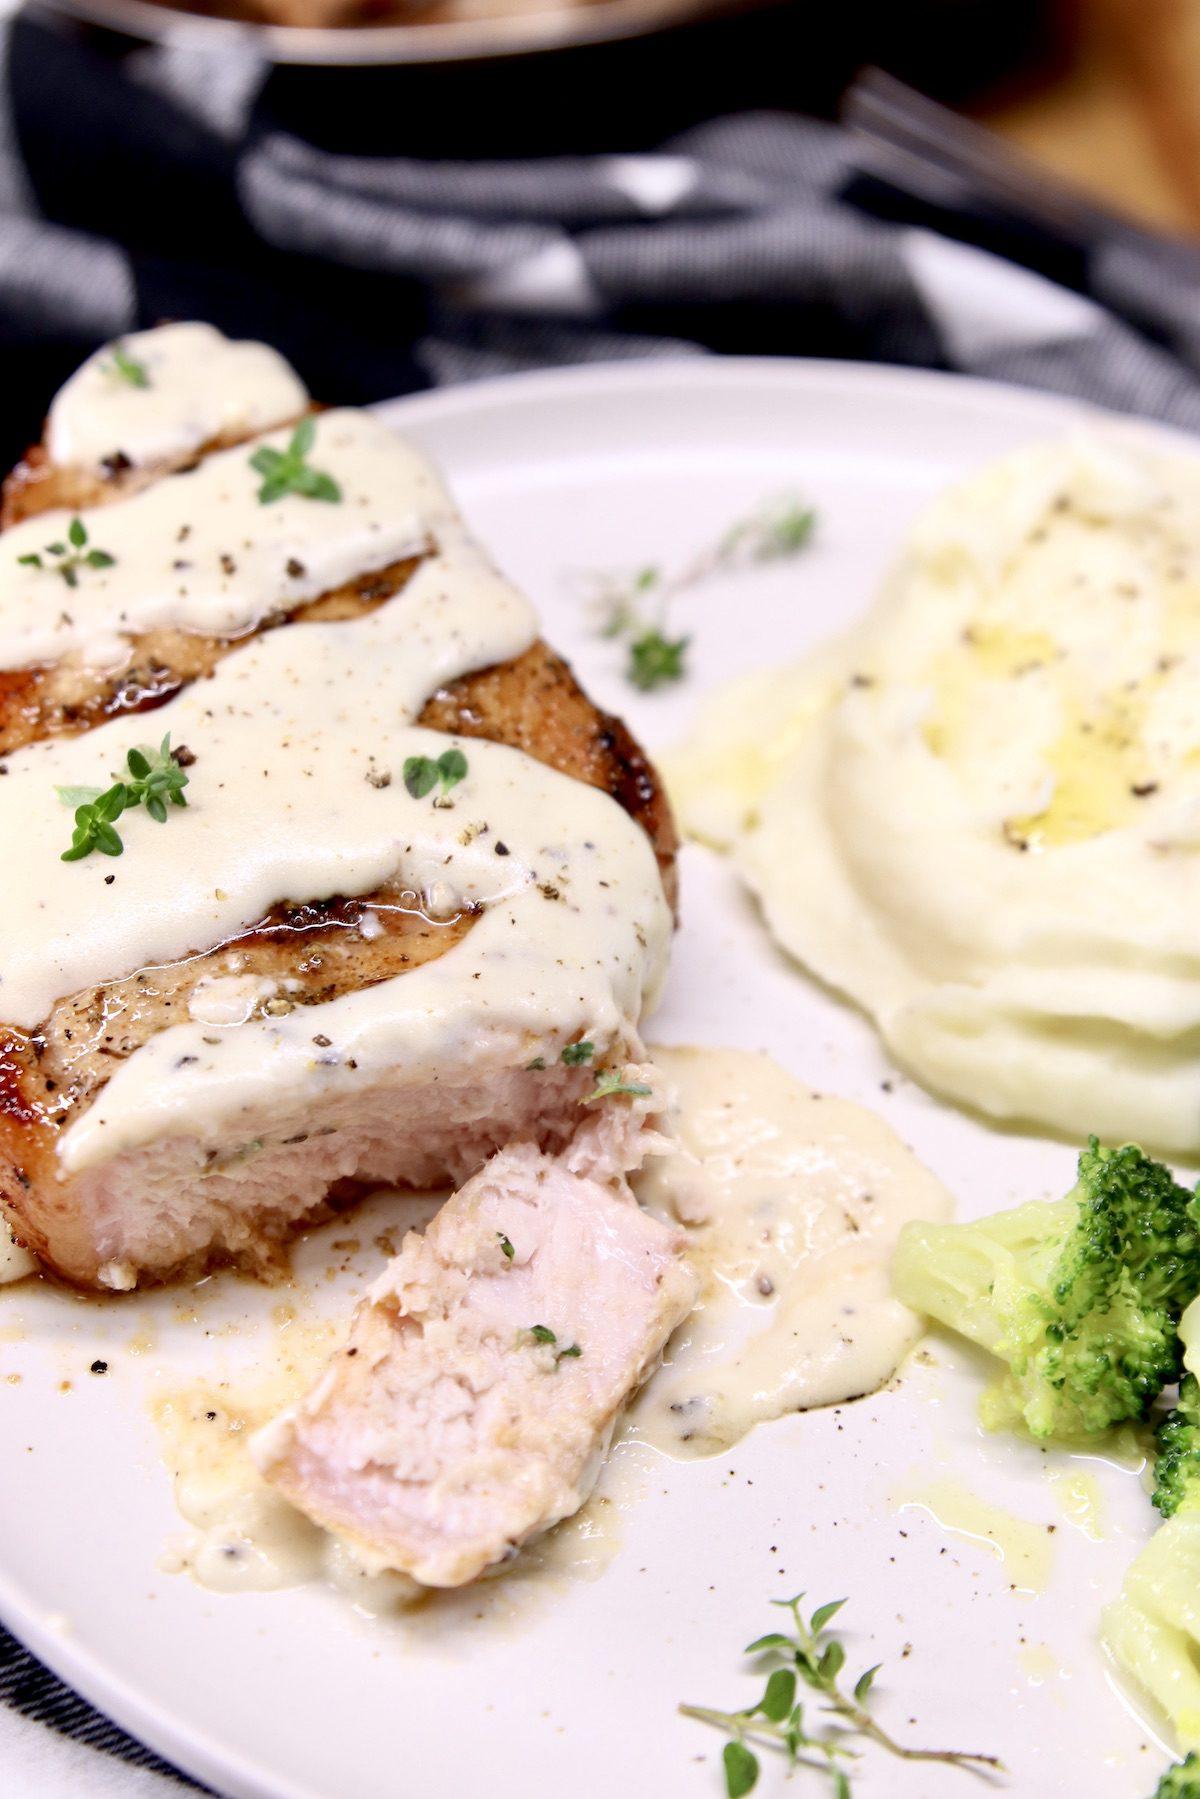 smothered pork chop on a plate, one slice - mashed potatoes & broccoli on a plate